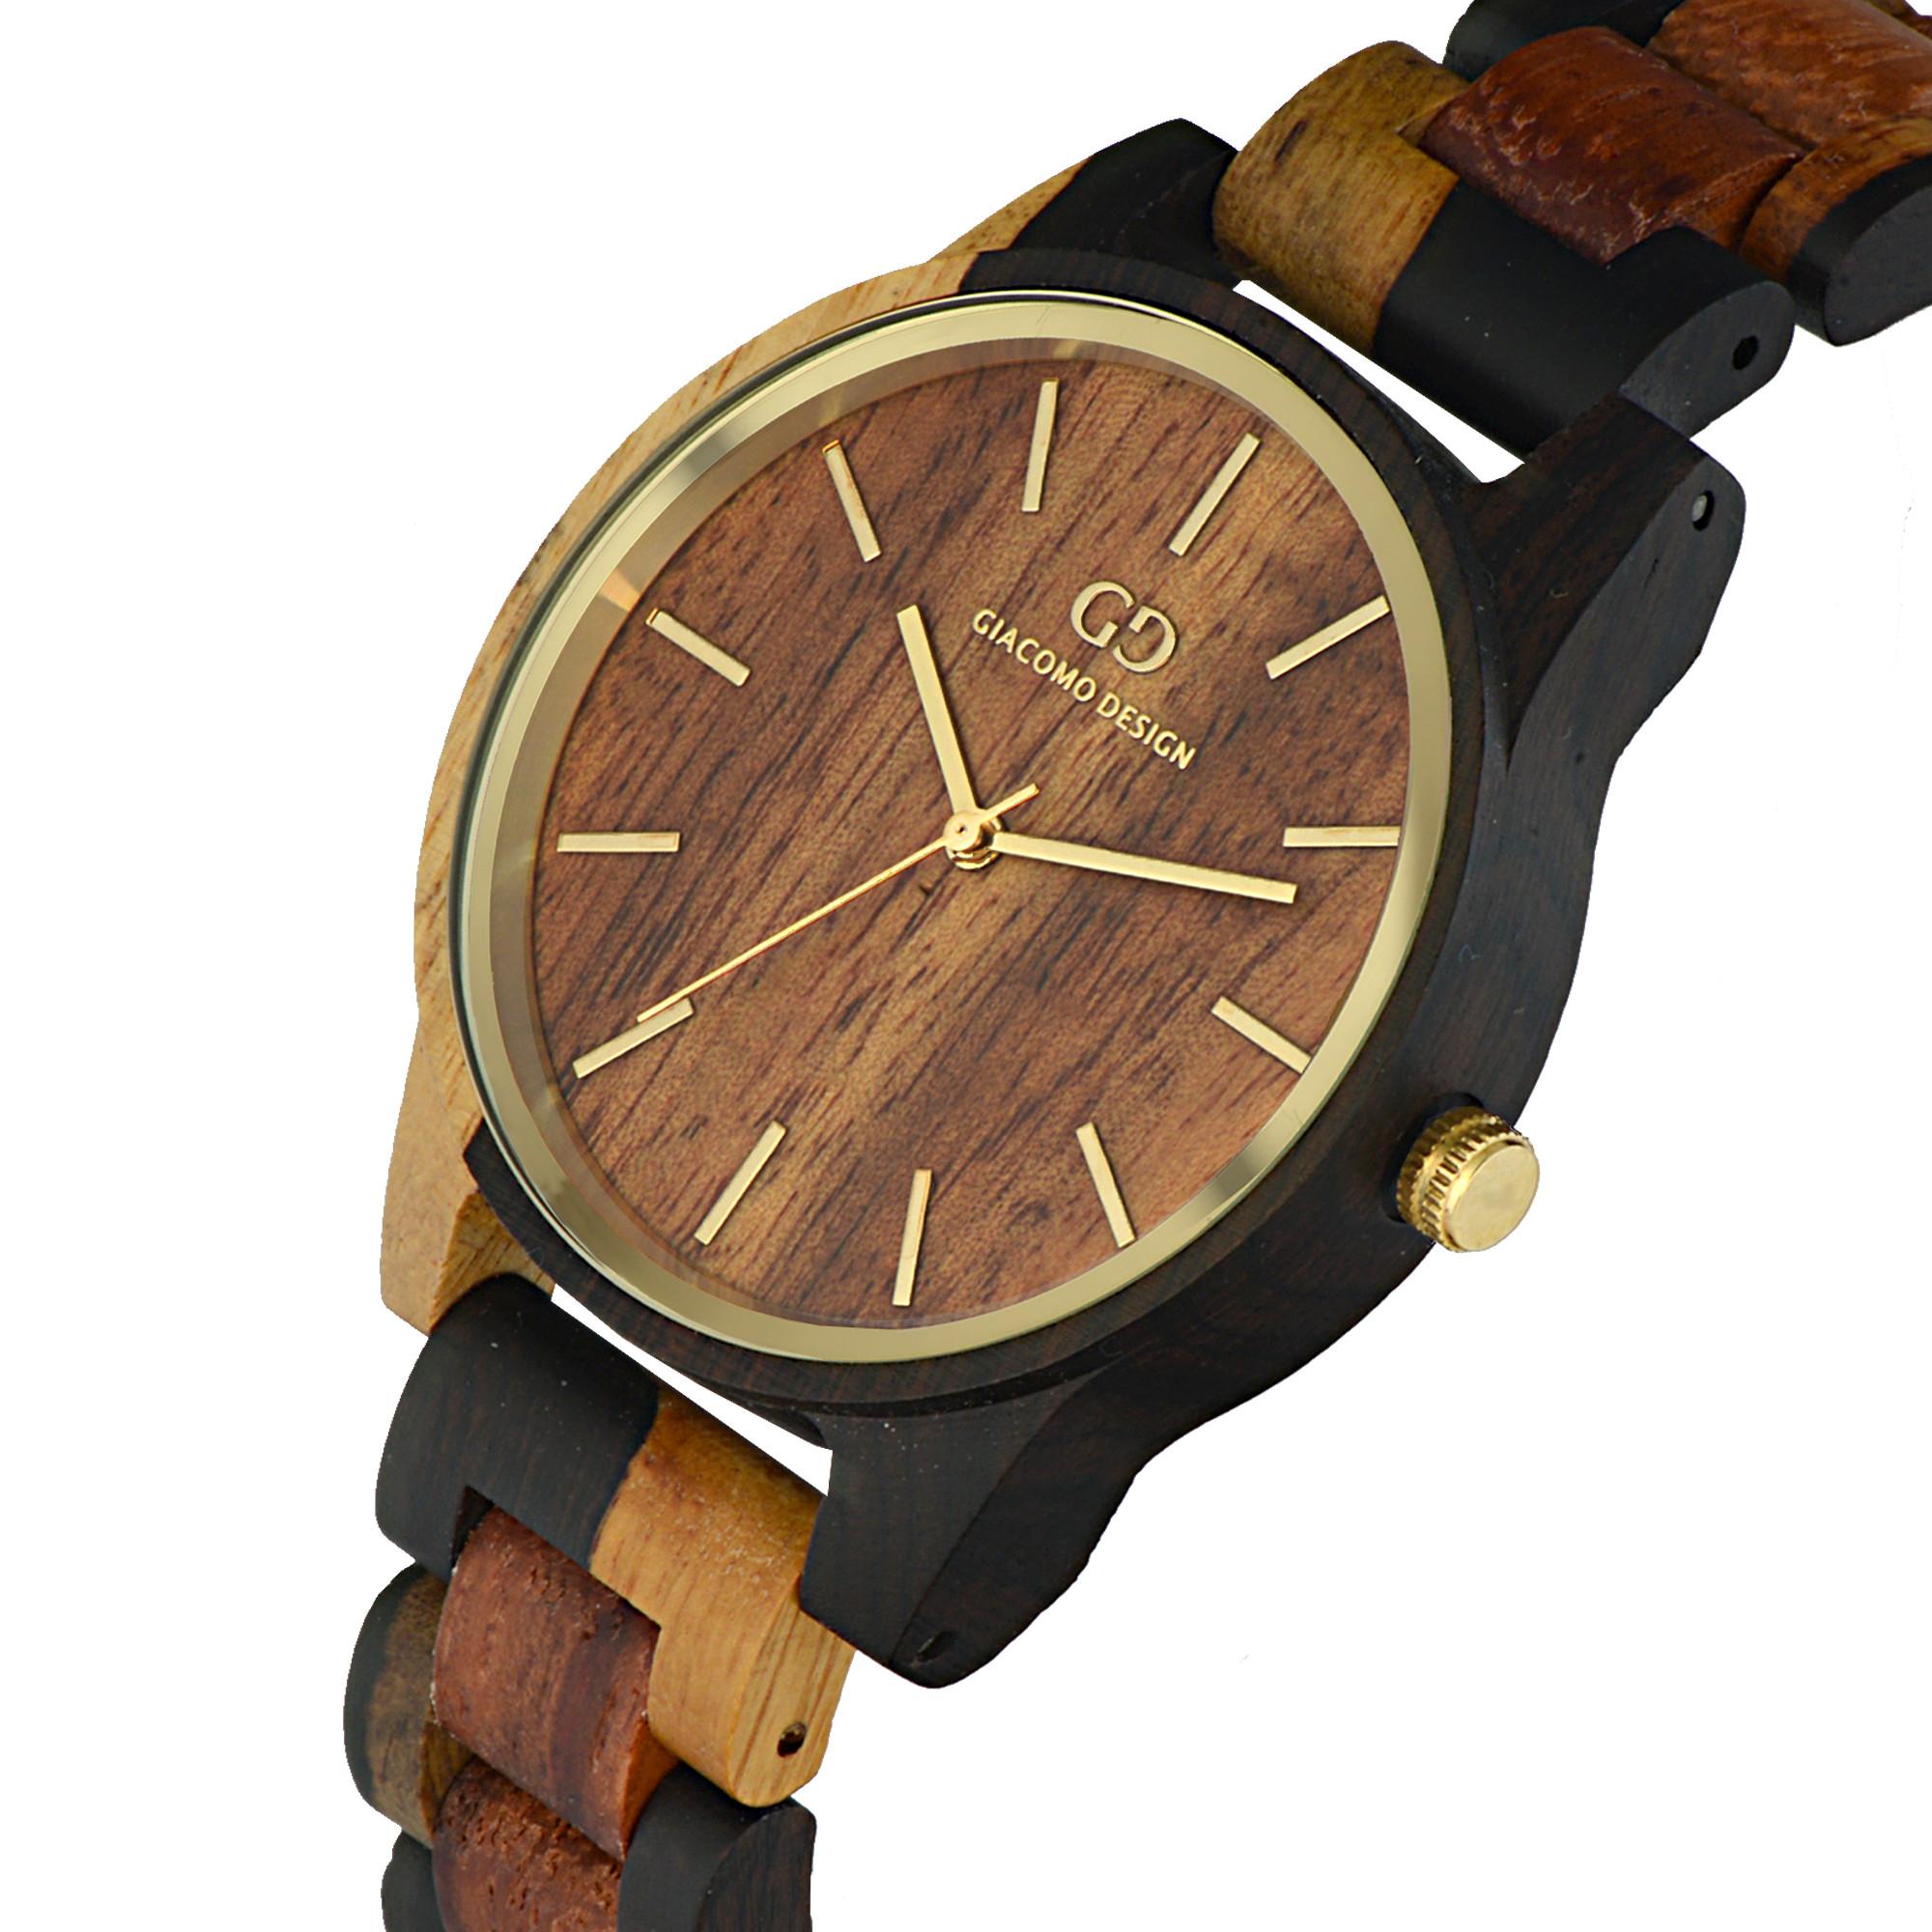 Giacomo Design wood watch Eleganza Semplice GD08205 rose/ sandal wood